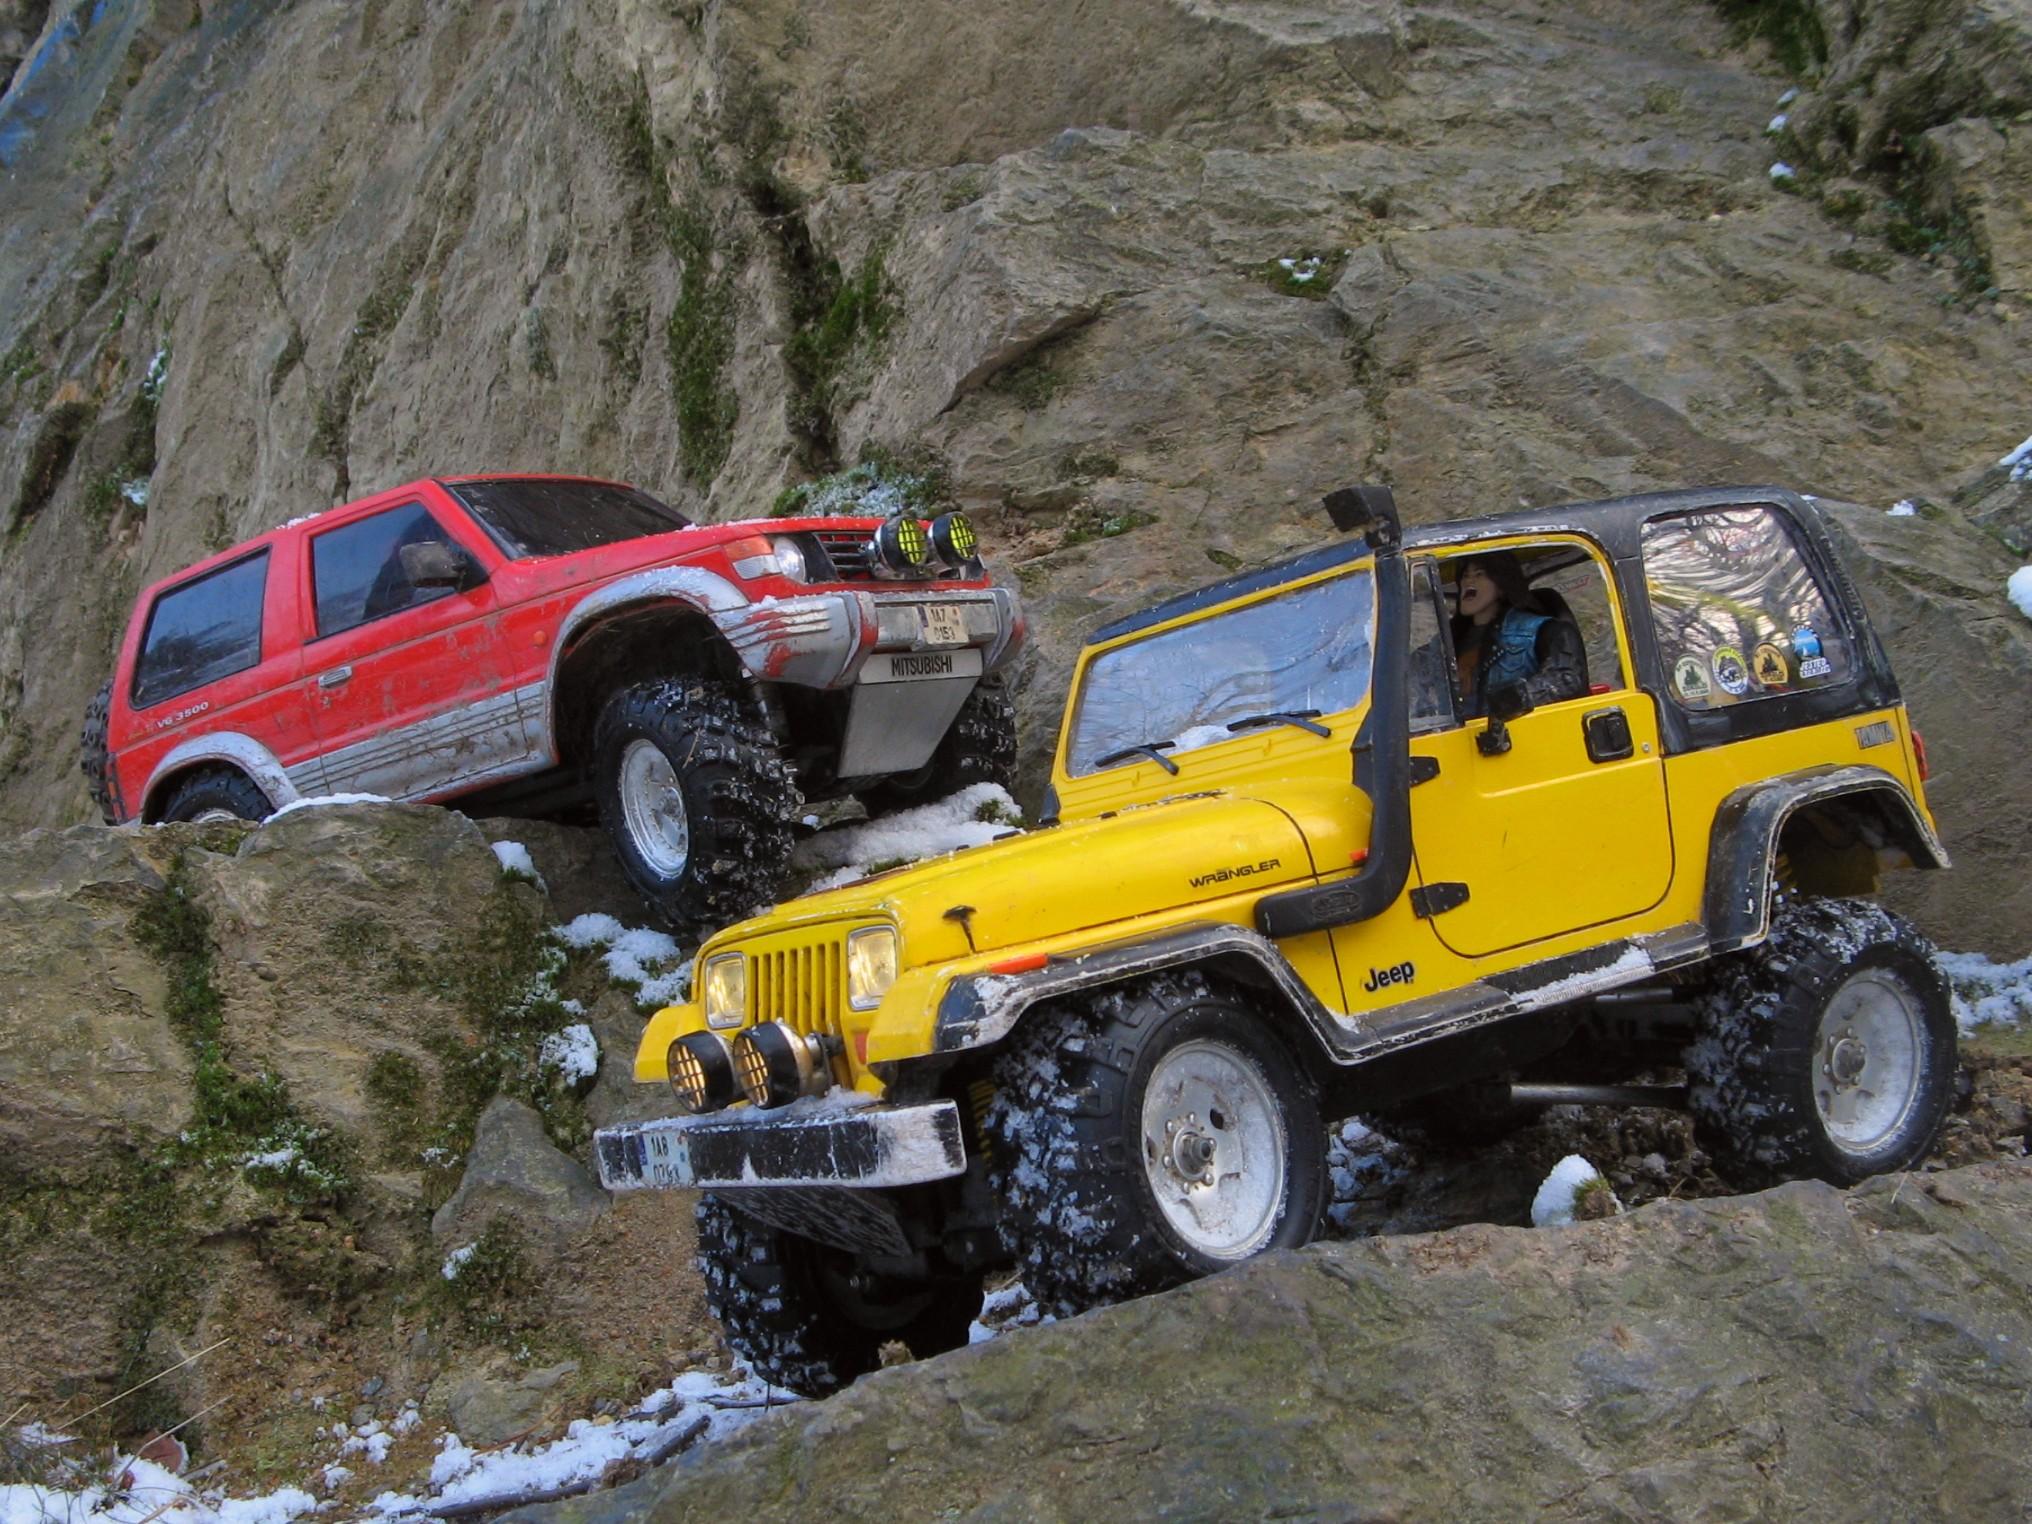 Jeep Wrangler Wiki >> File:Tamiya CC-01, Jeep Wrangler YJ a Mitsubishi Pajero.jpg - Wikimedia Commons